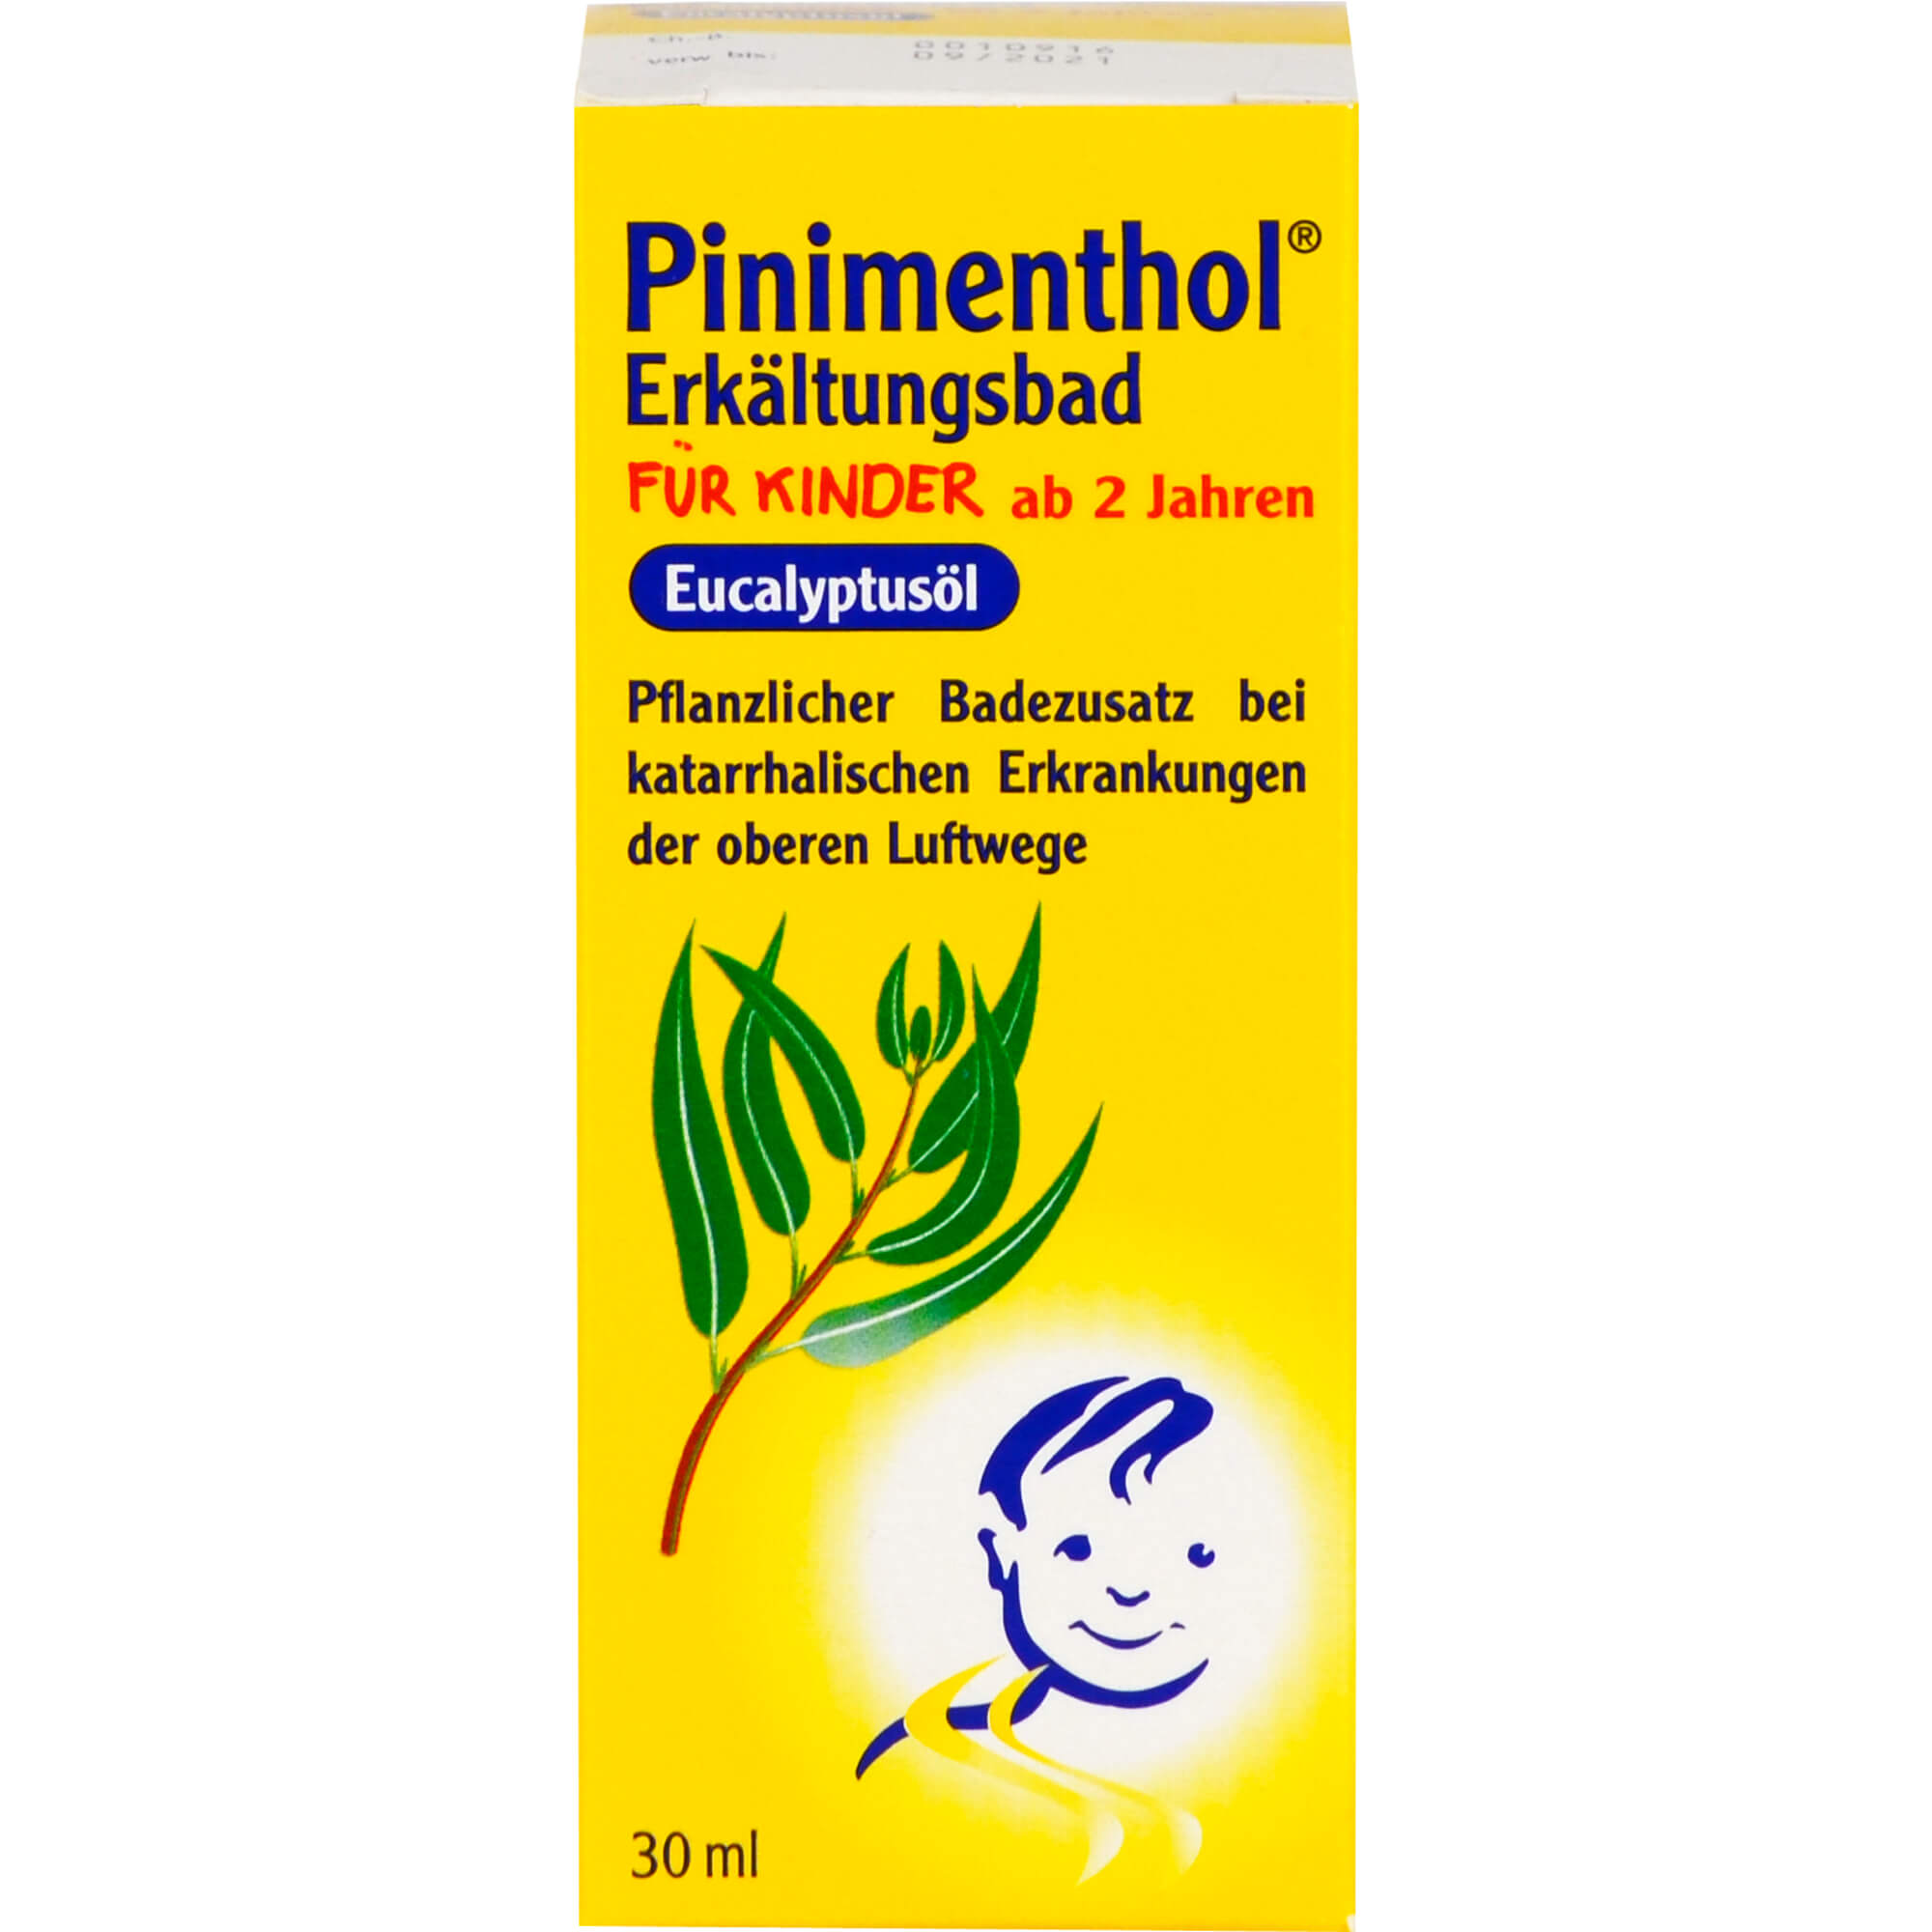 PINIMENTHOL-Erkaeltungsbad-f-Kind-ab-2-J-Eucalyptus